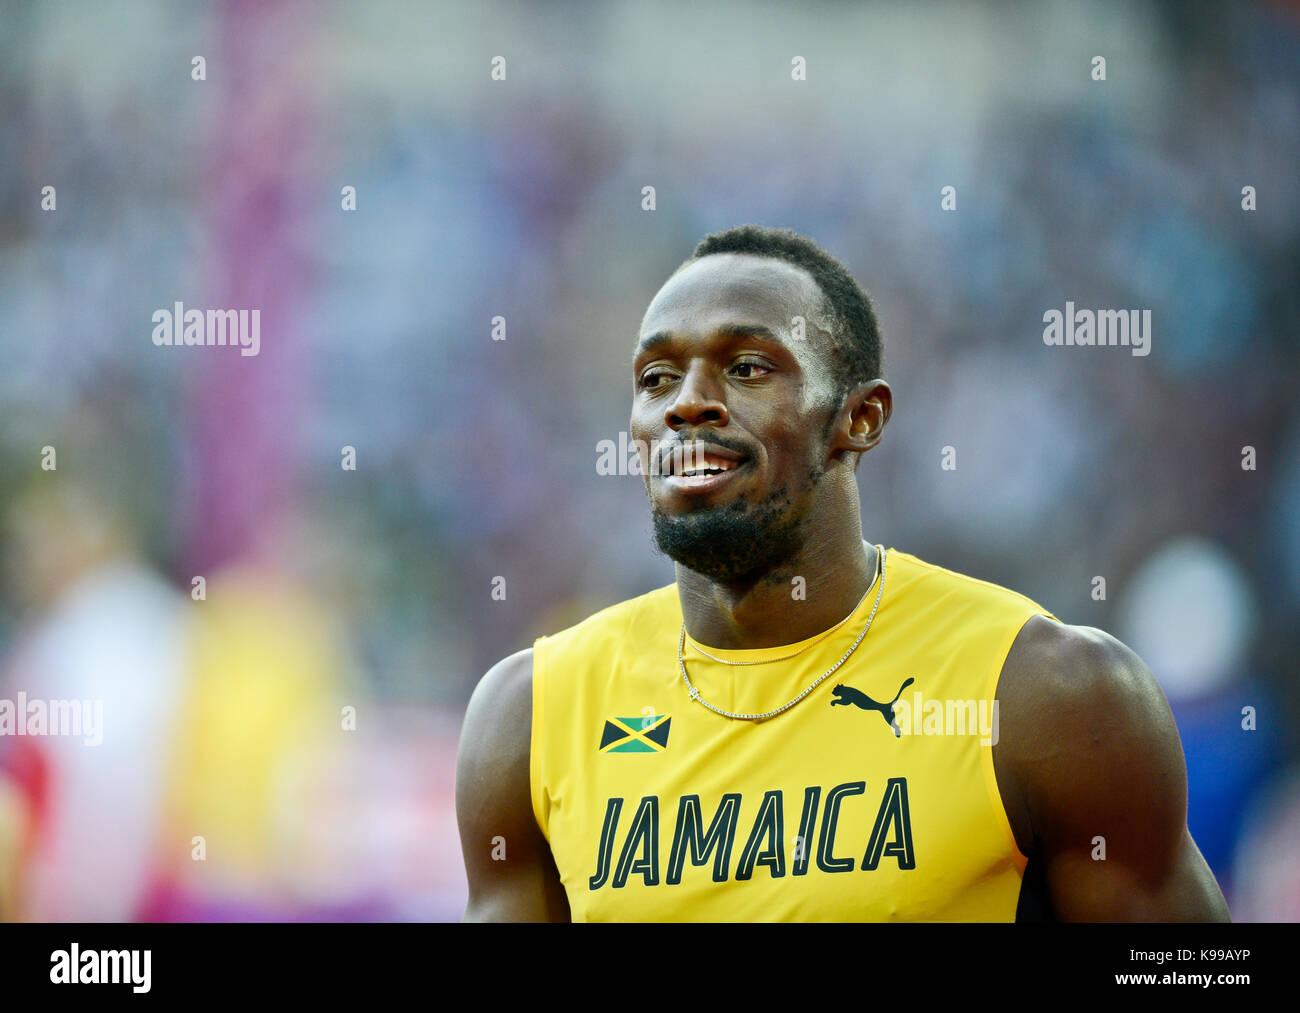 Usain Bolt (Jamaica) - IAAF Athletics World Championships - London 2017 - Stock Image